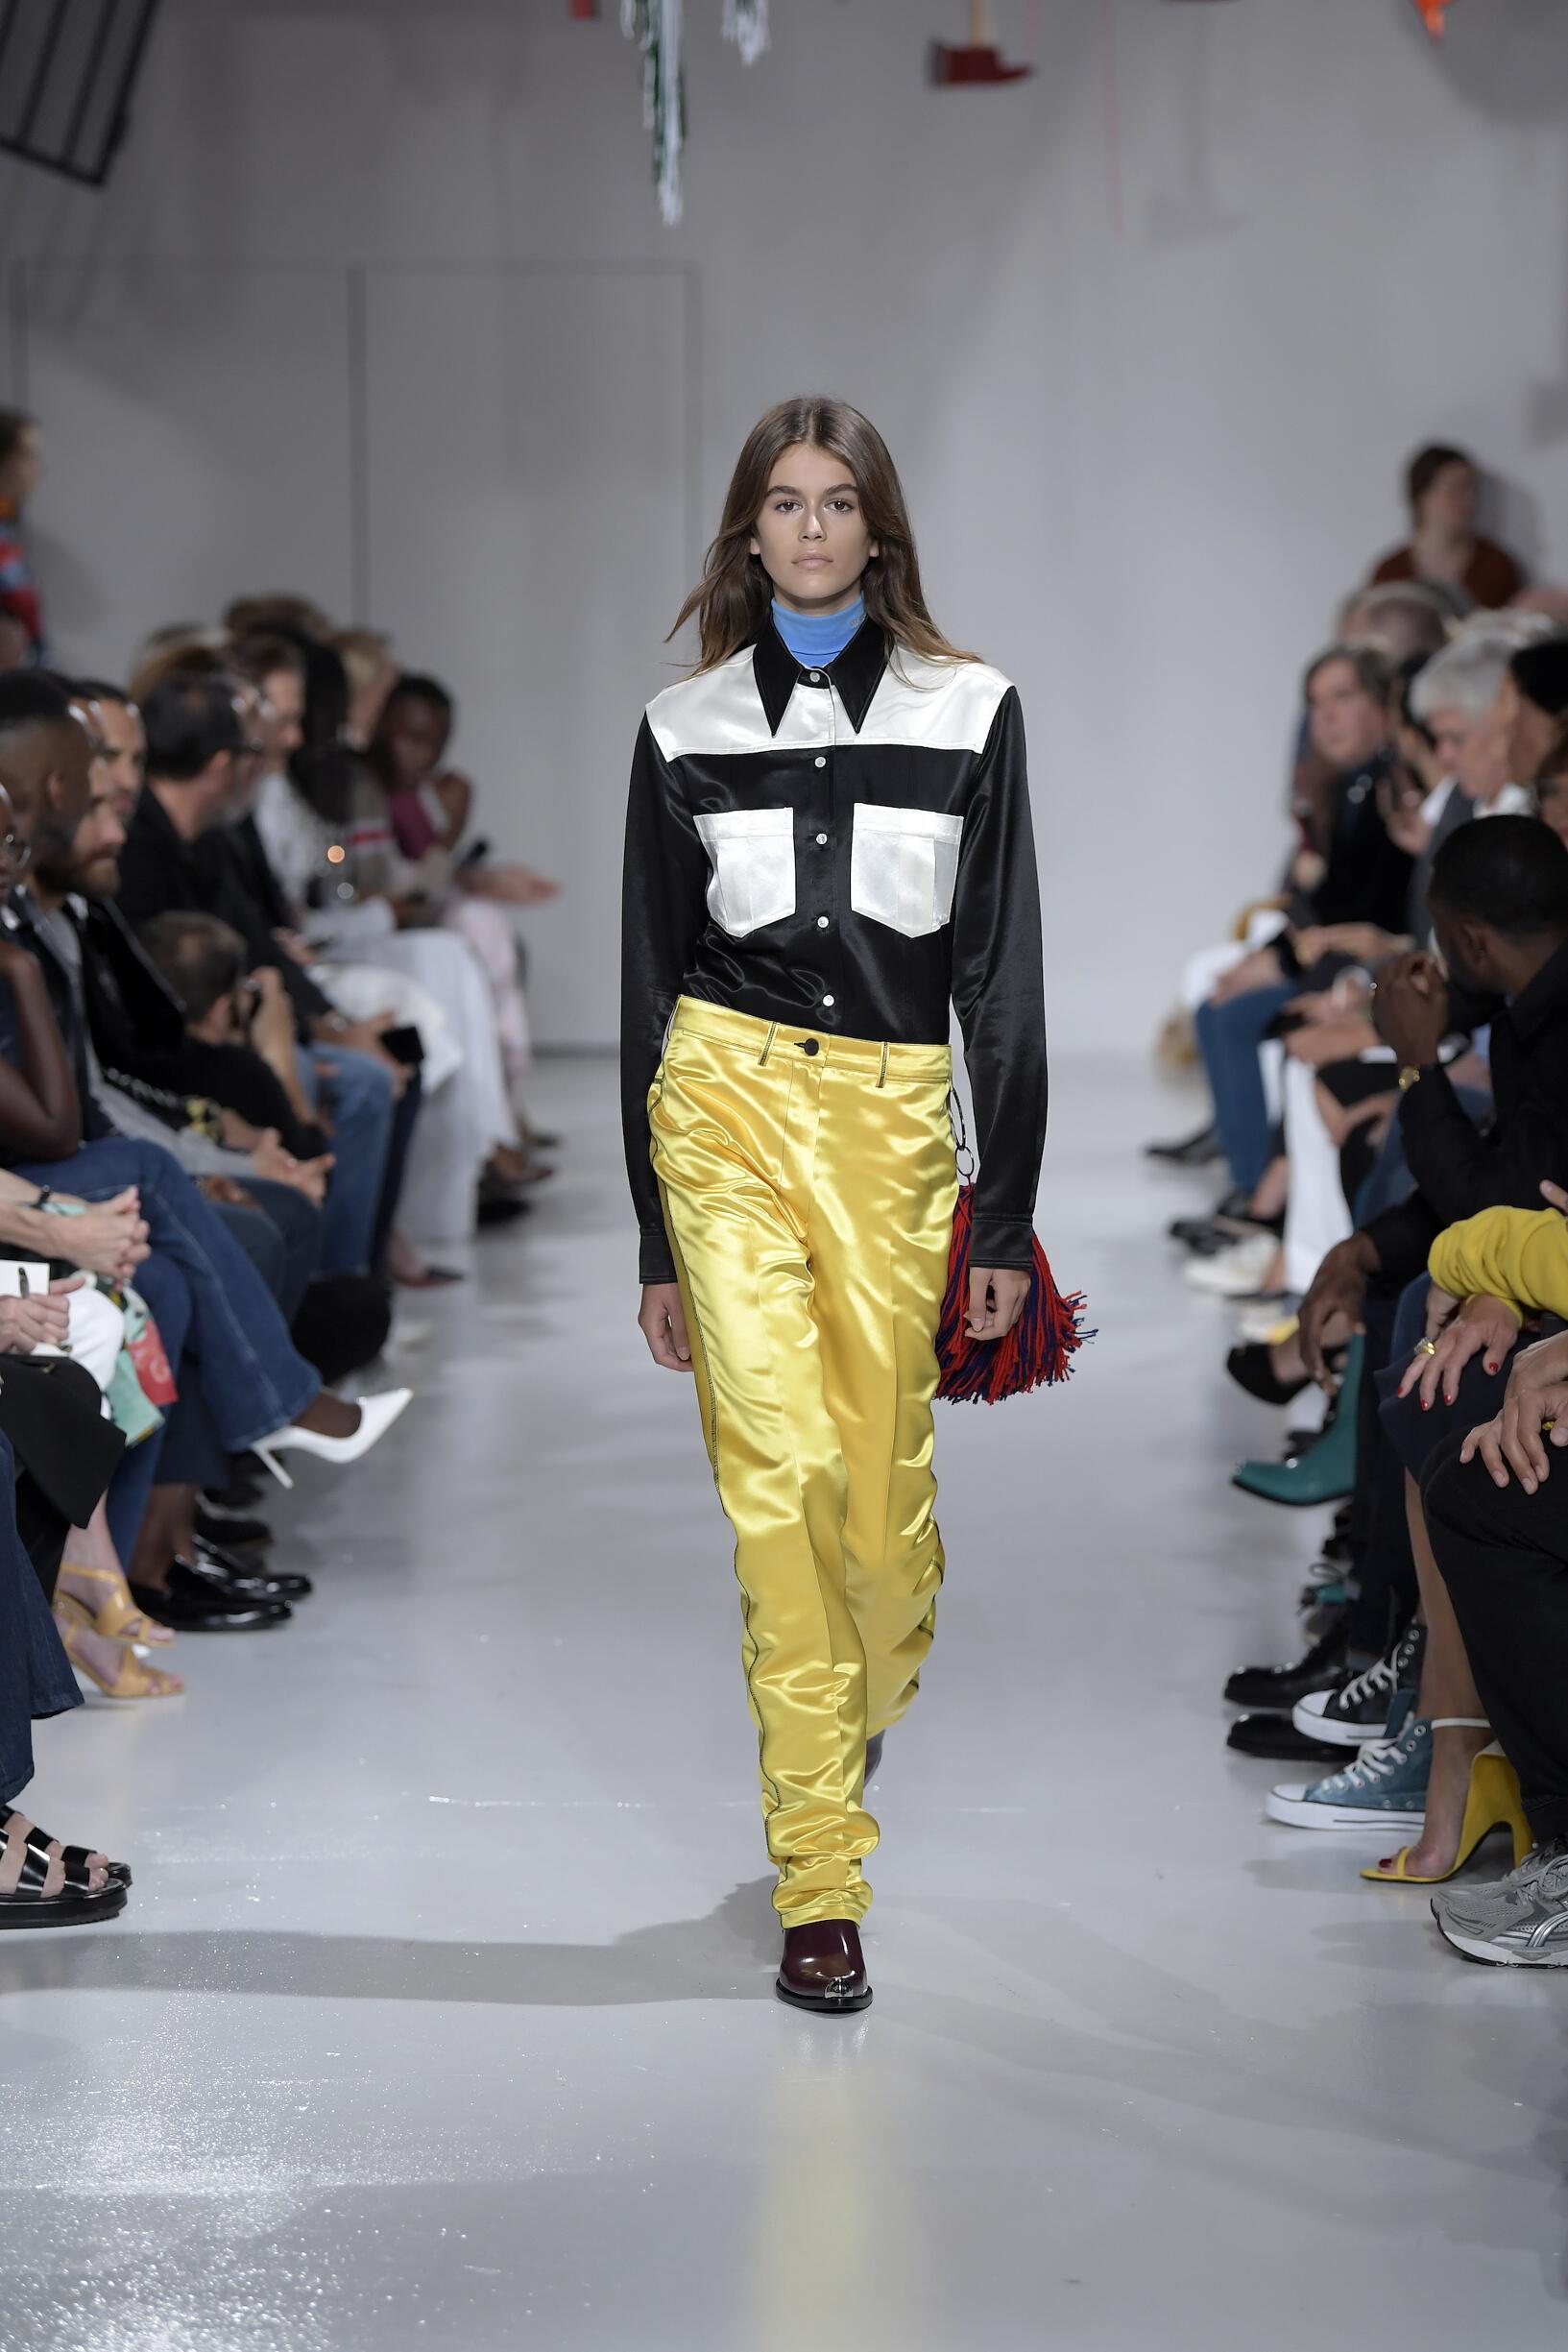 SS 2018 Fashion Show Calvin Klein 205W39NYC